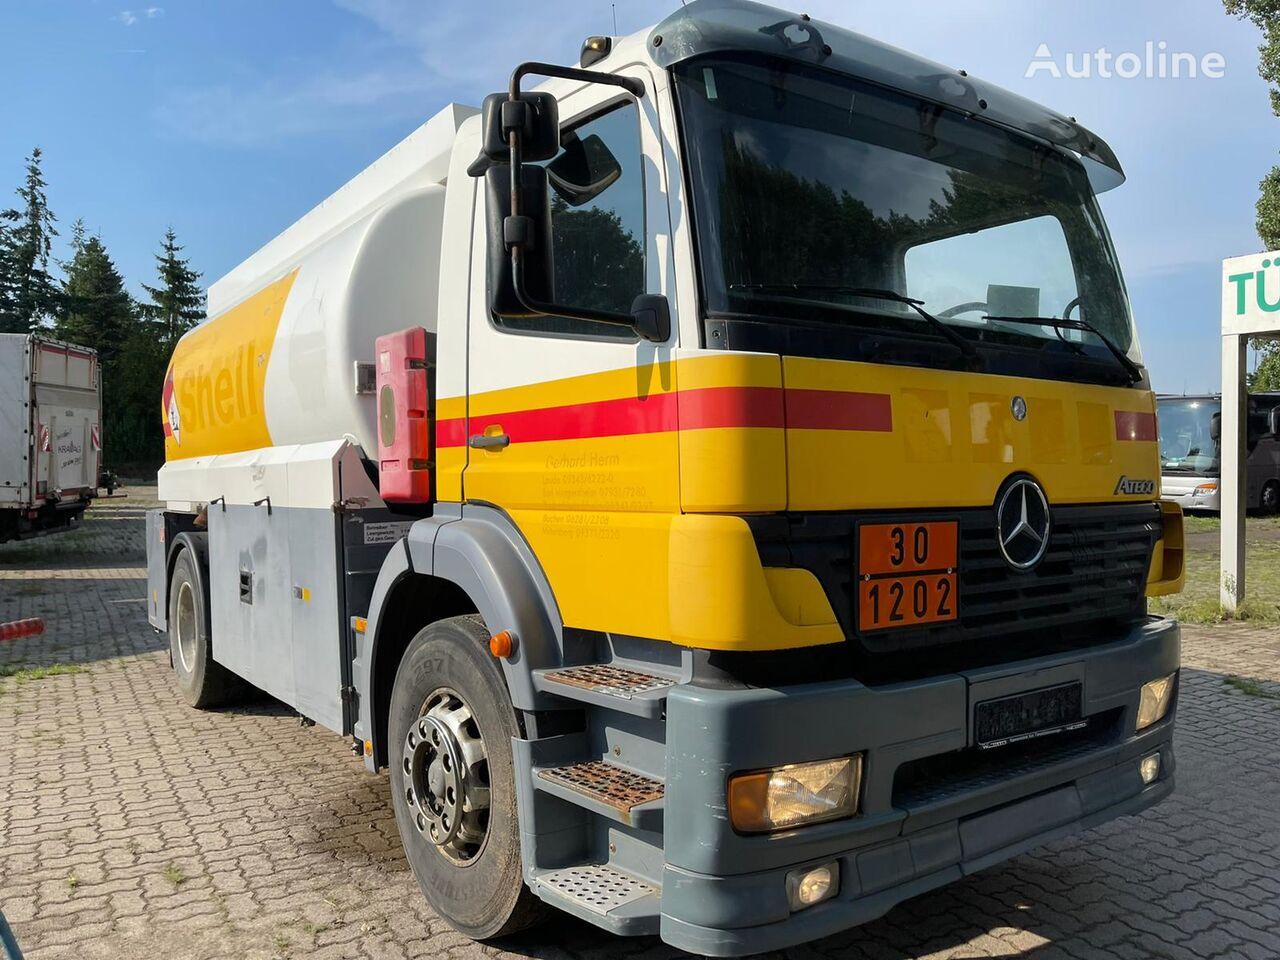 油罐车 MERCEDES-BENZ 1828 L Atego Tankwagen 14.000LTr mit 2 Kammern